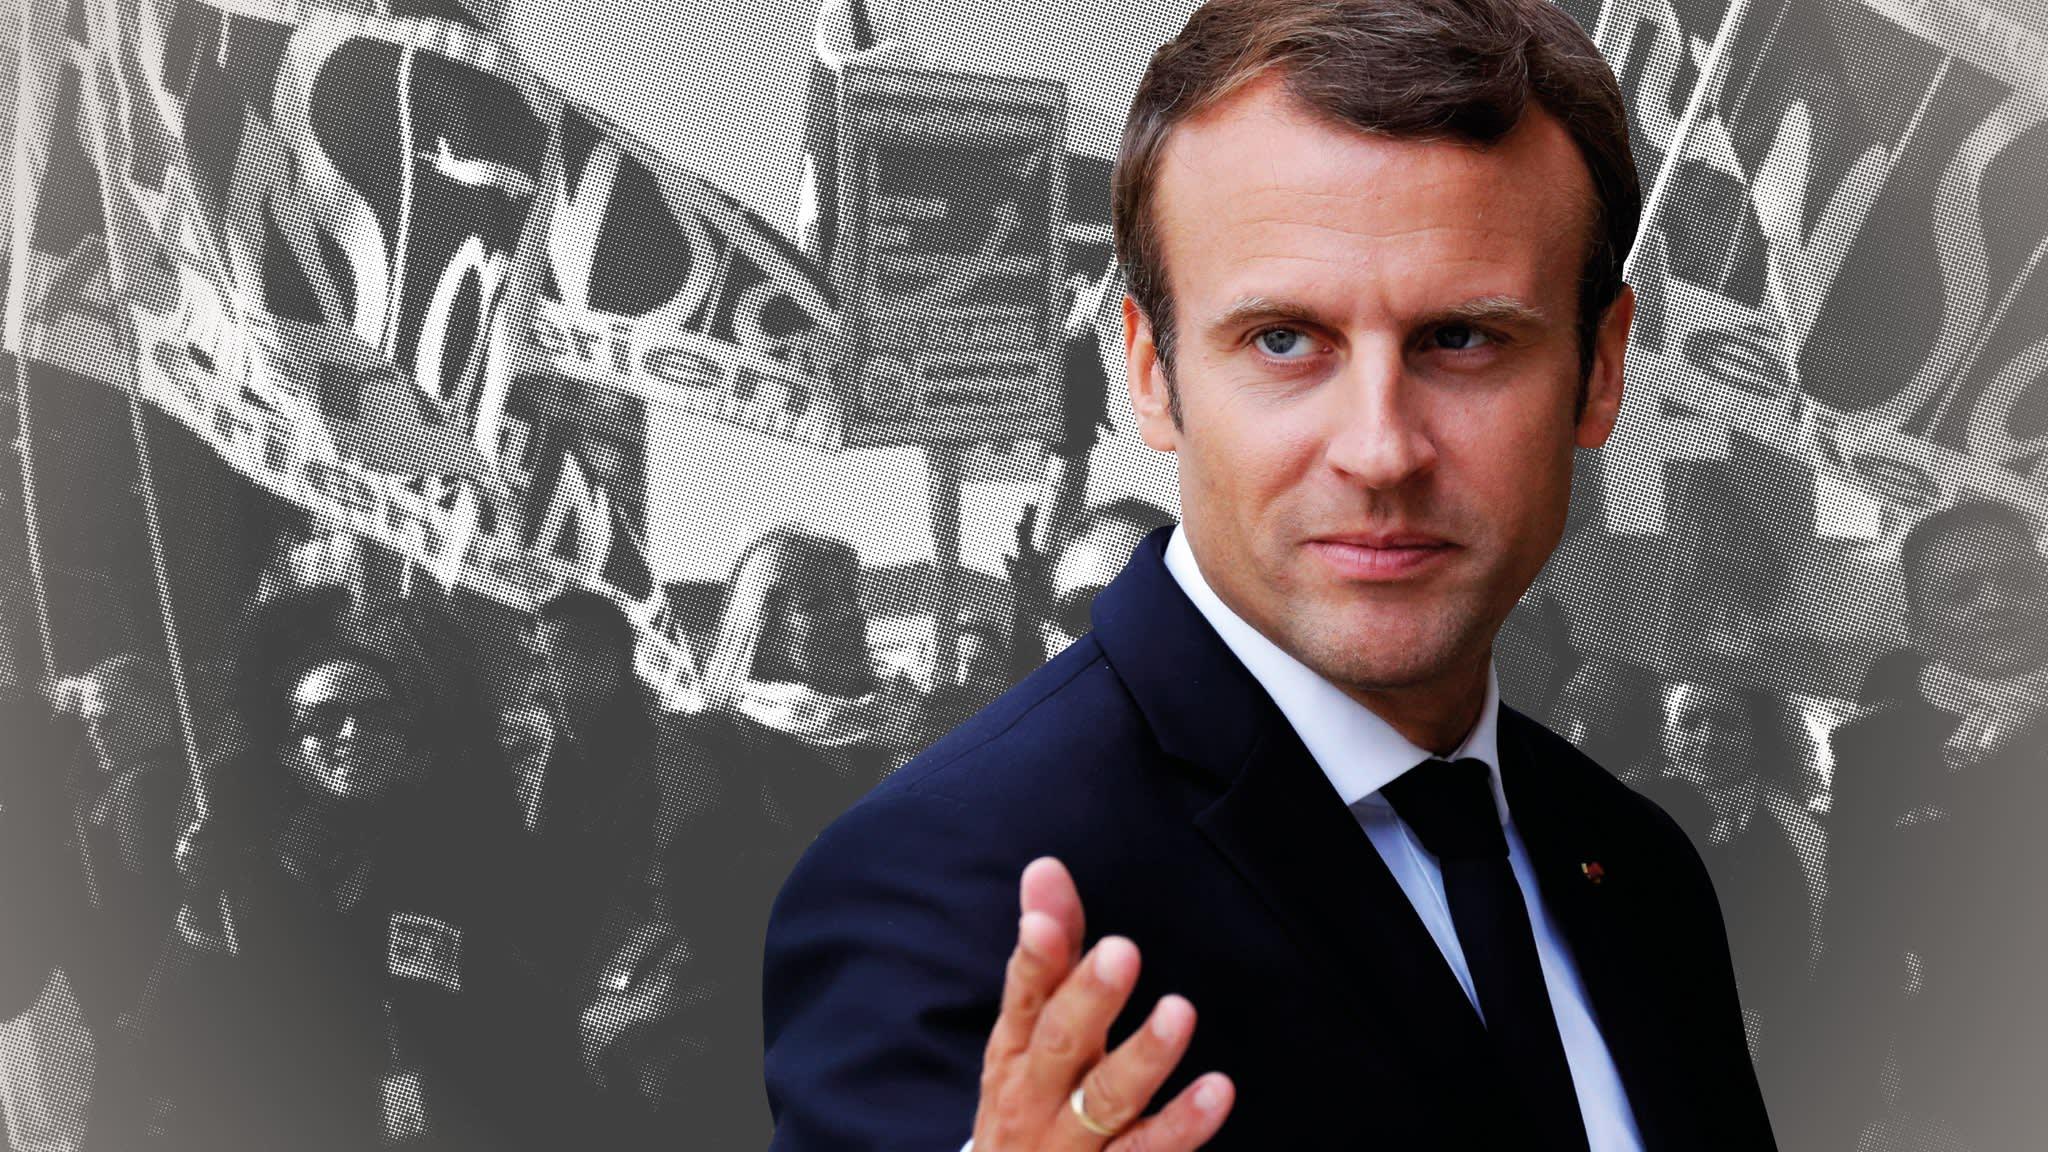 Emmanuel Macron seizes moment to take on French unions